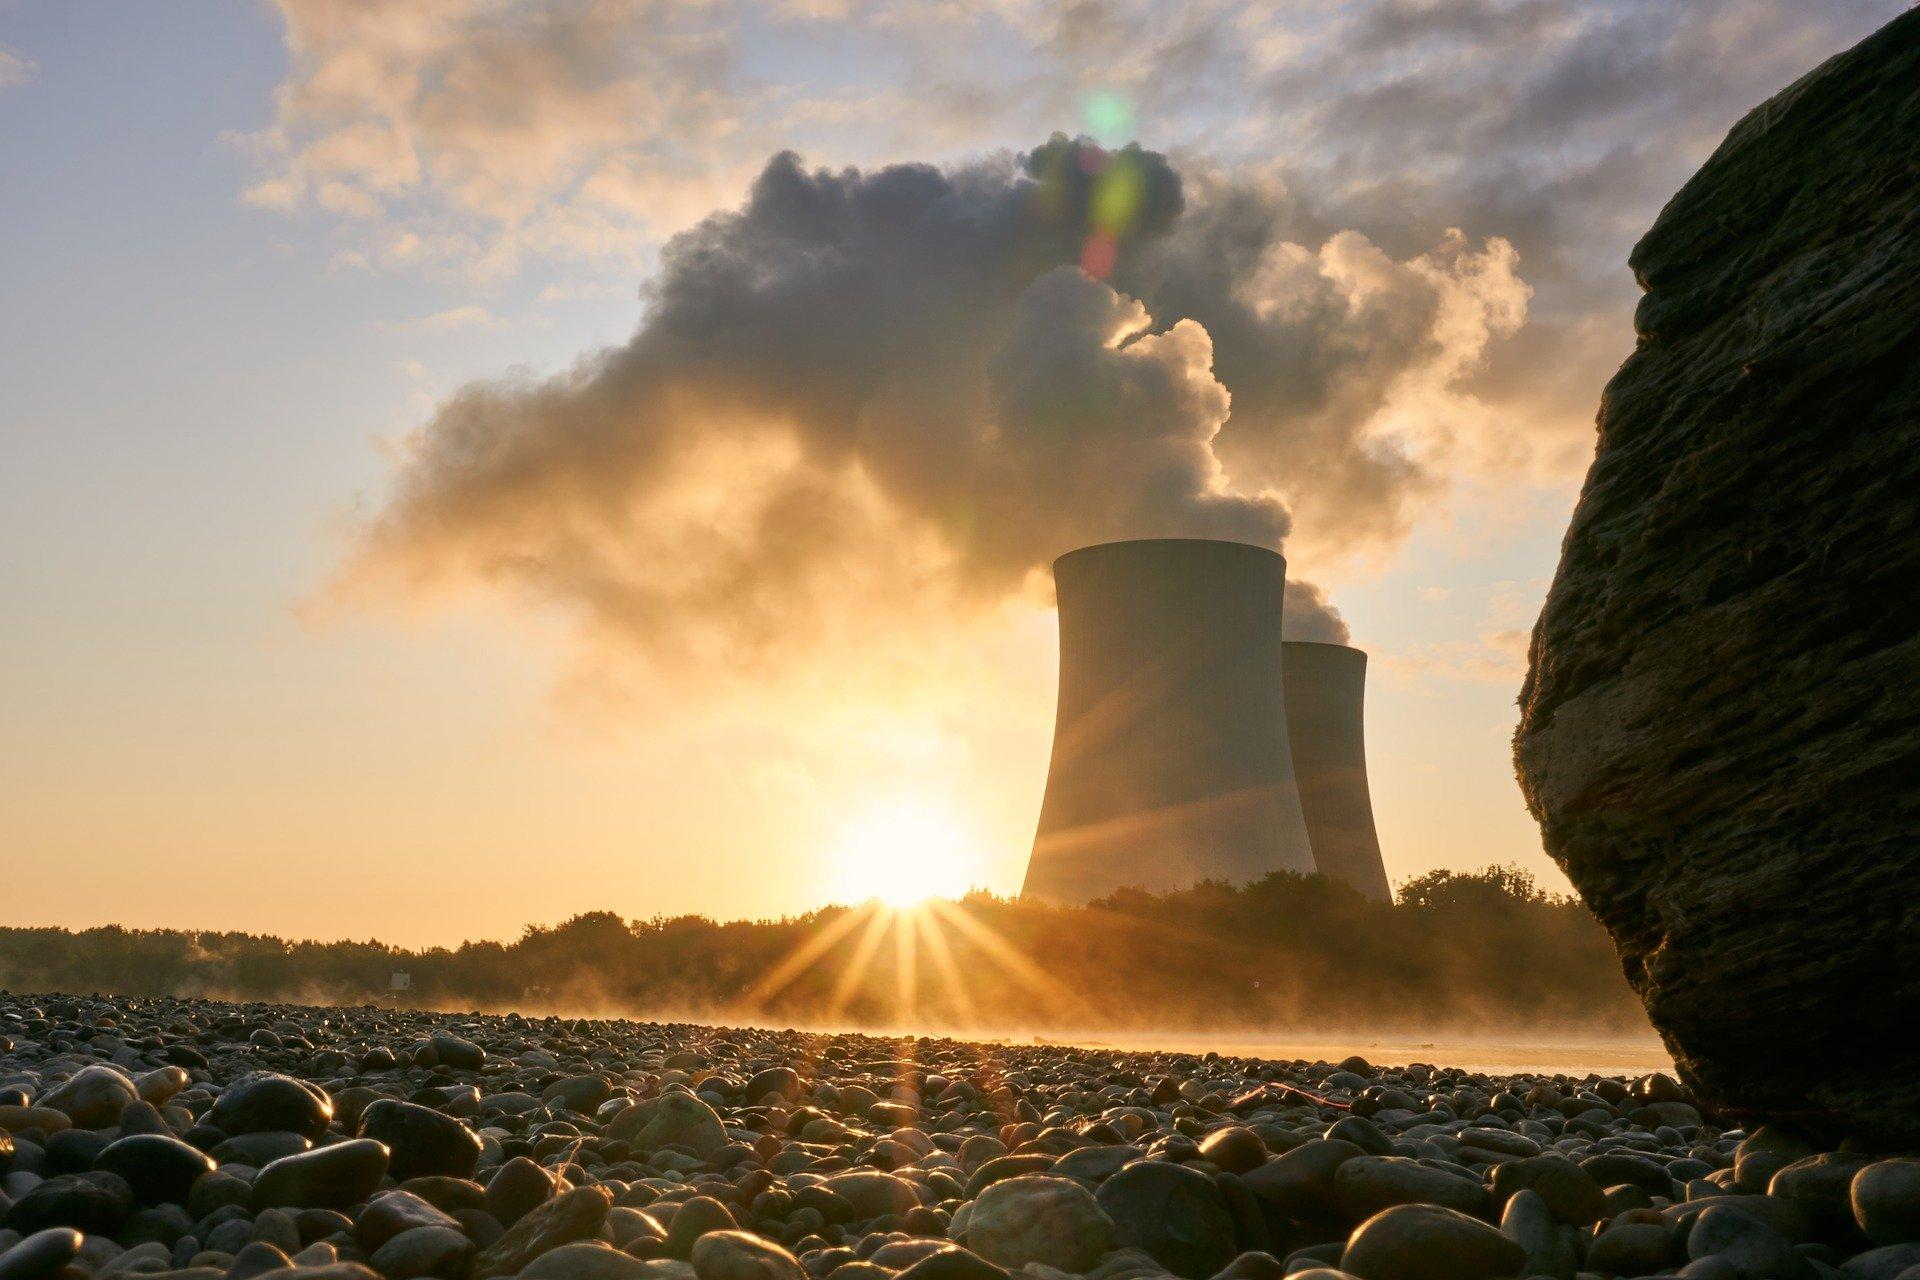 cee onu objectifs climatiques nucleaire - L'Energeek